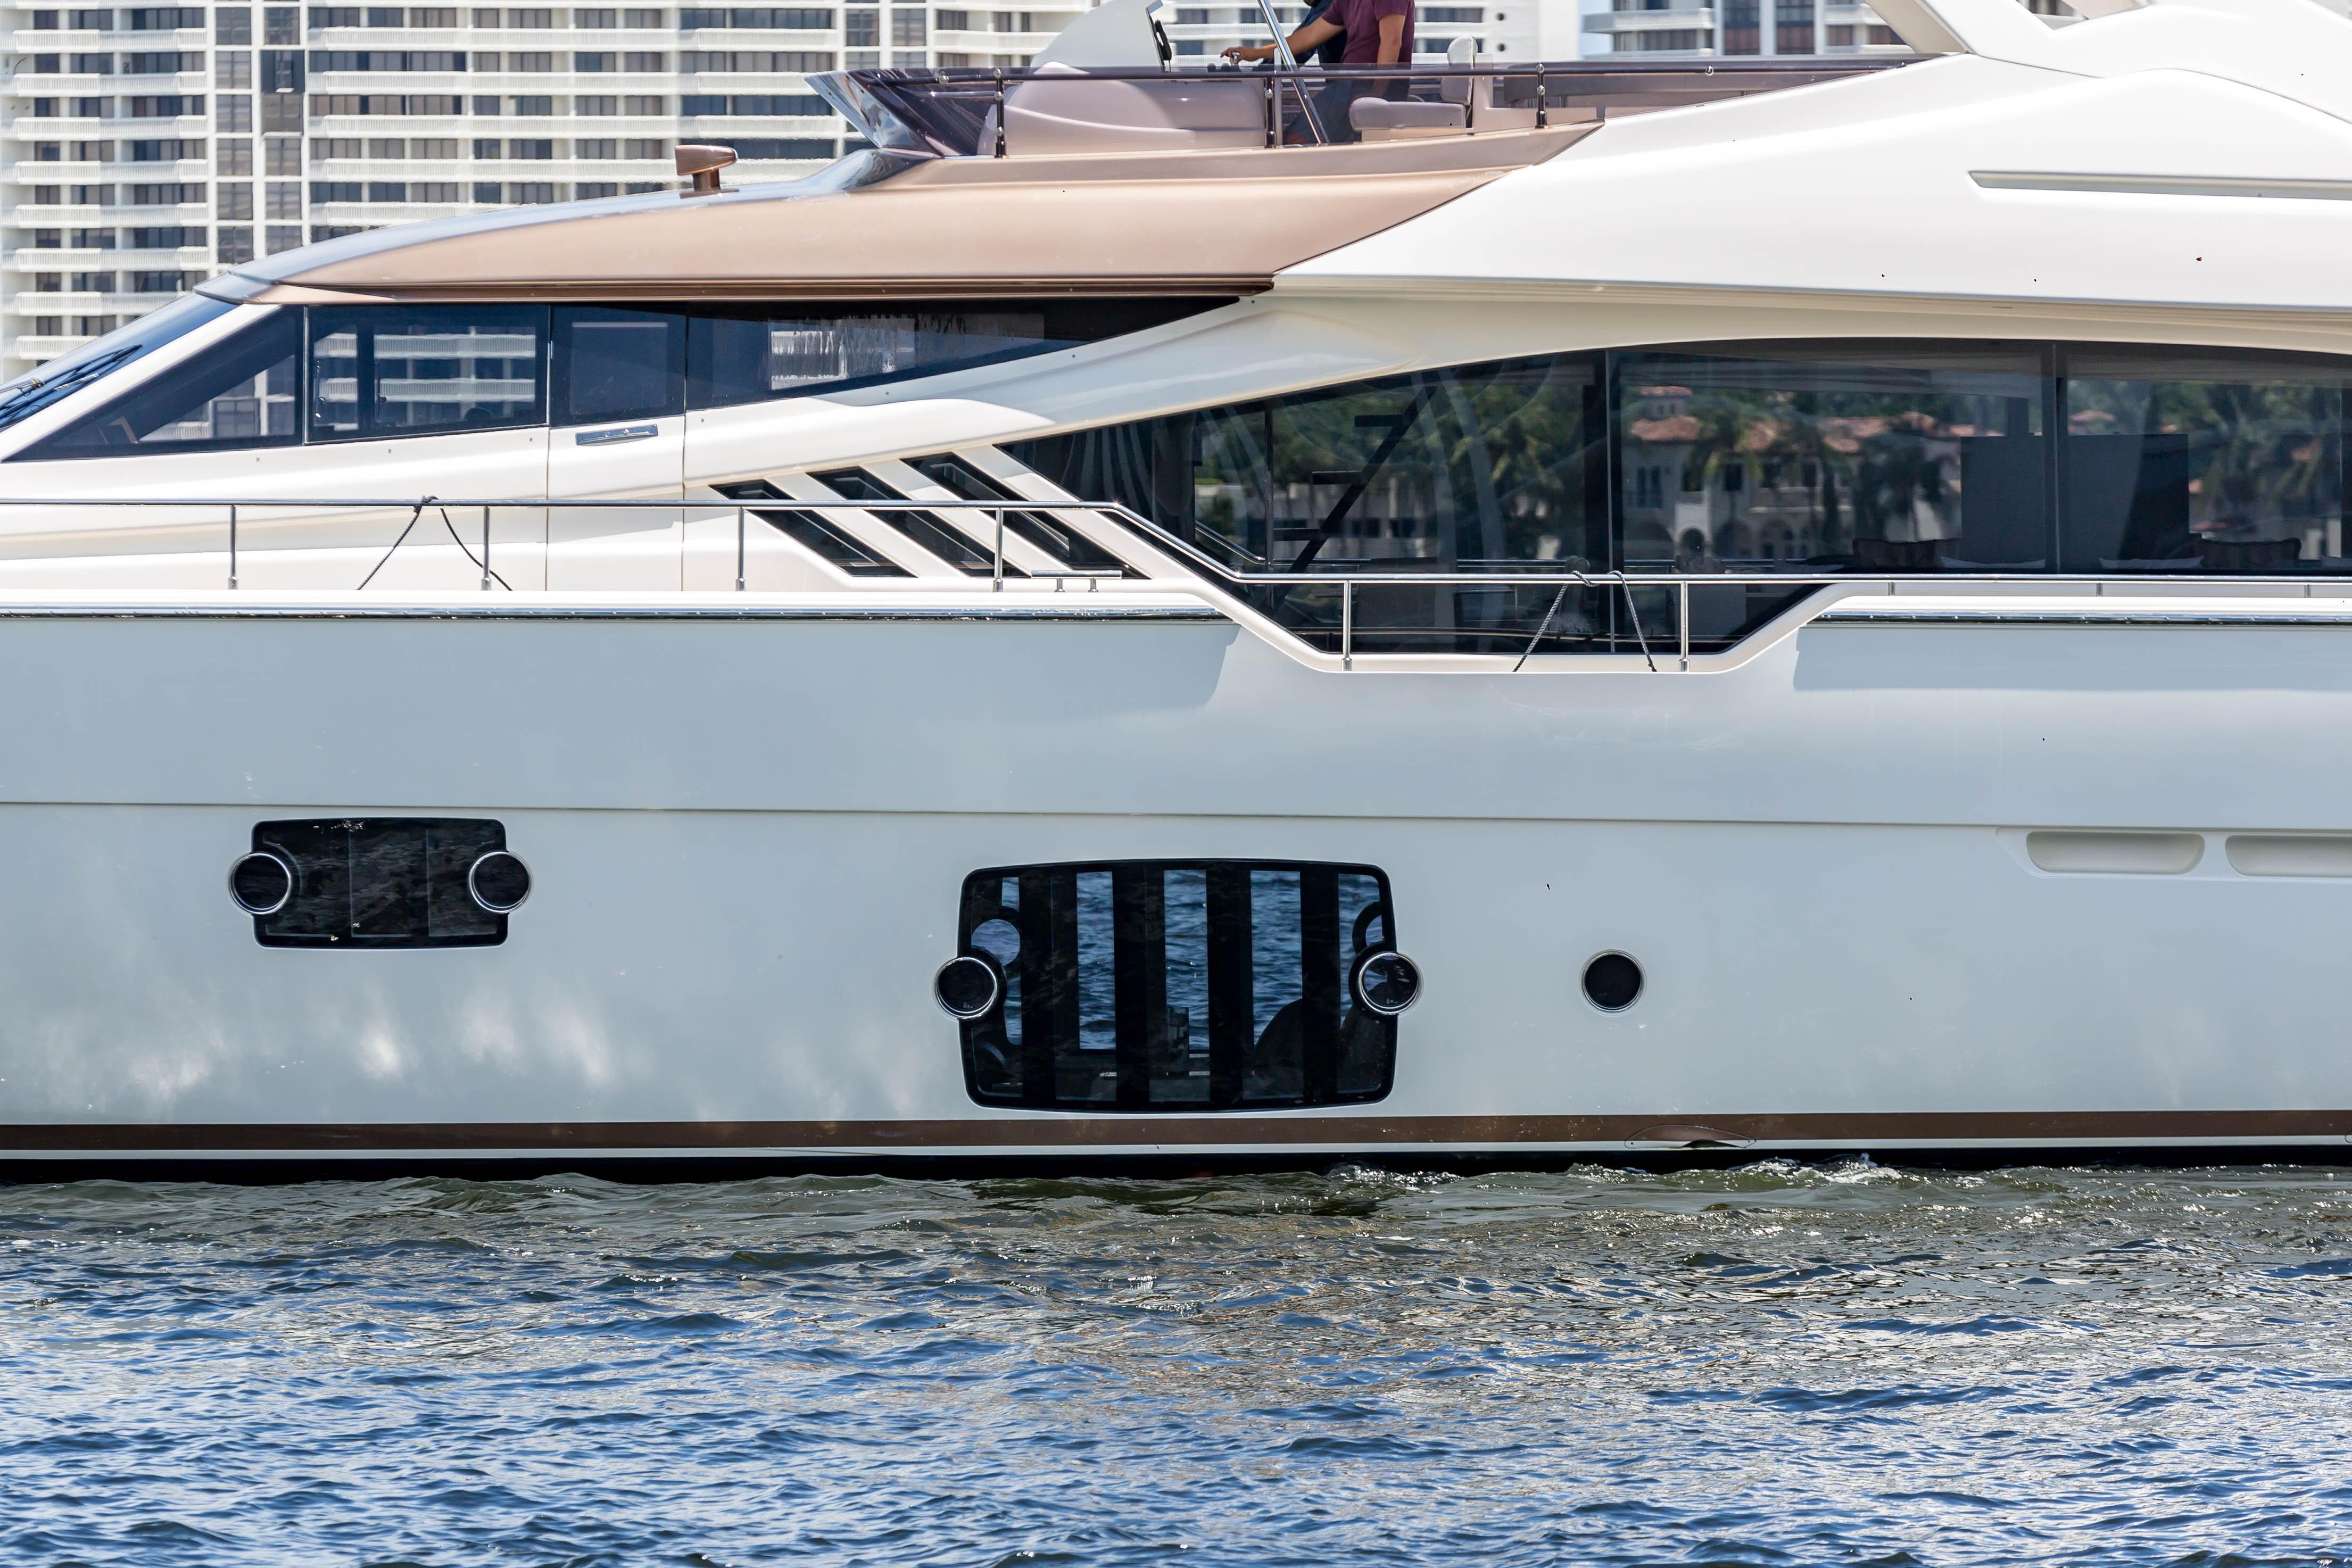 2016  Ferretti Yachts 870 Paola IV - Profile